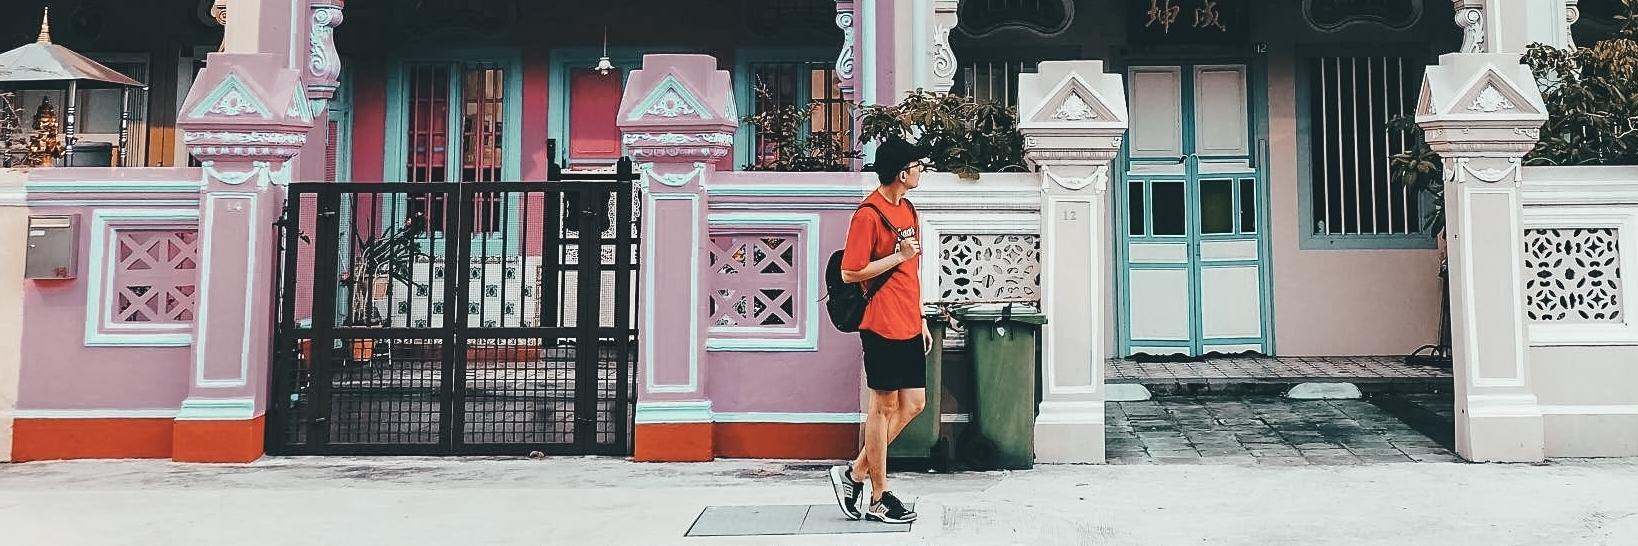 https://gody.vn/blog/seeyang.chan9777/post/singapore-giac-mo-mau-xanh-903